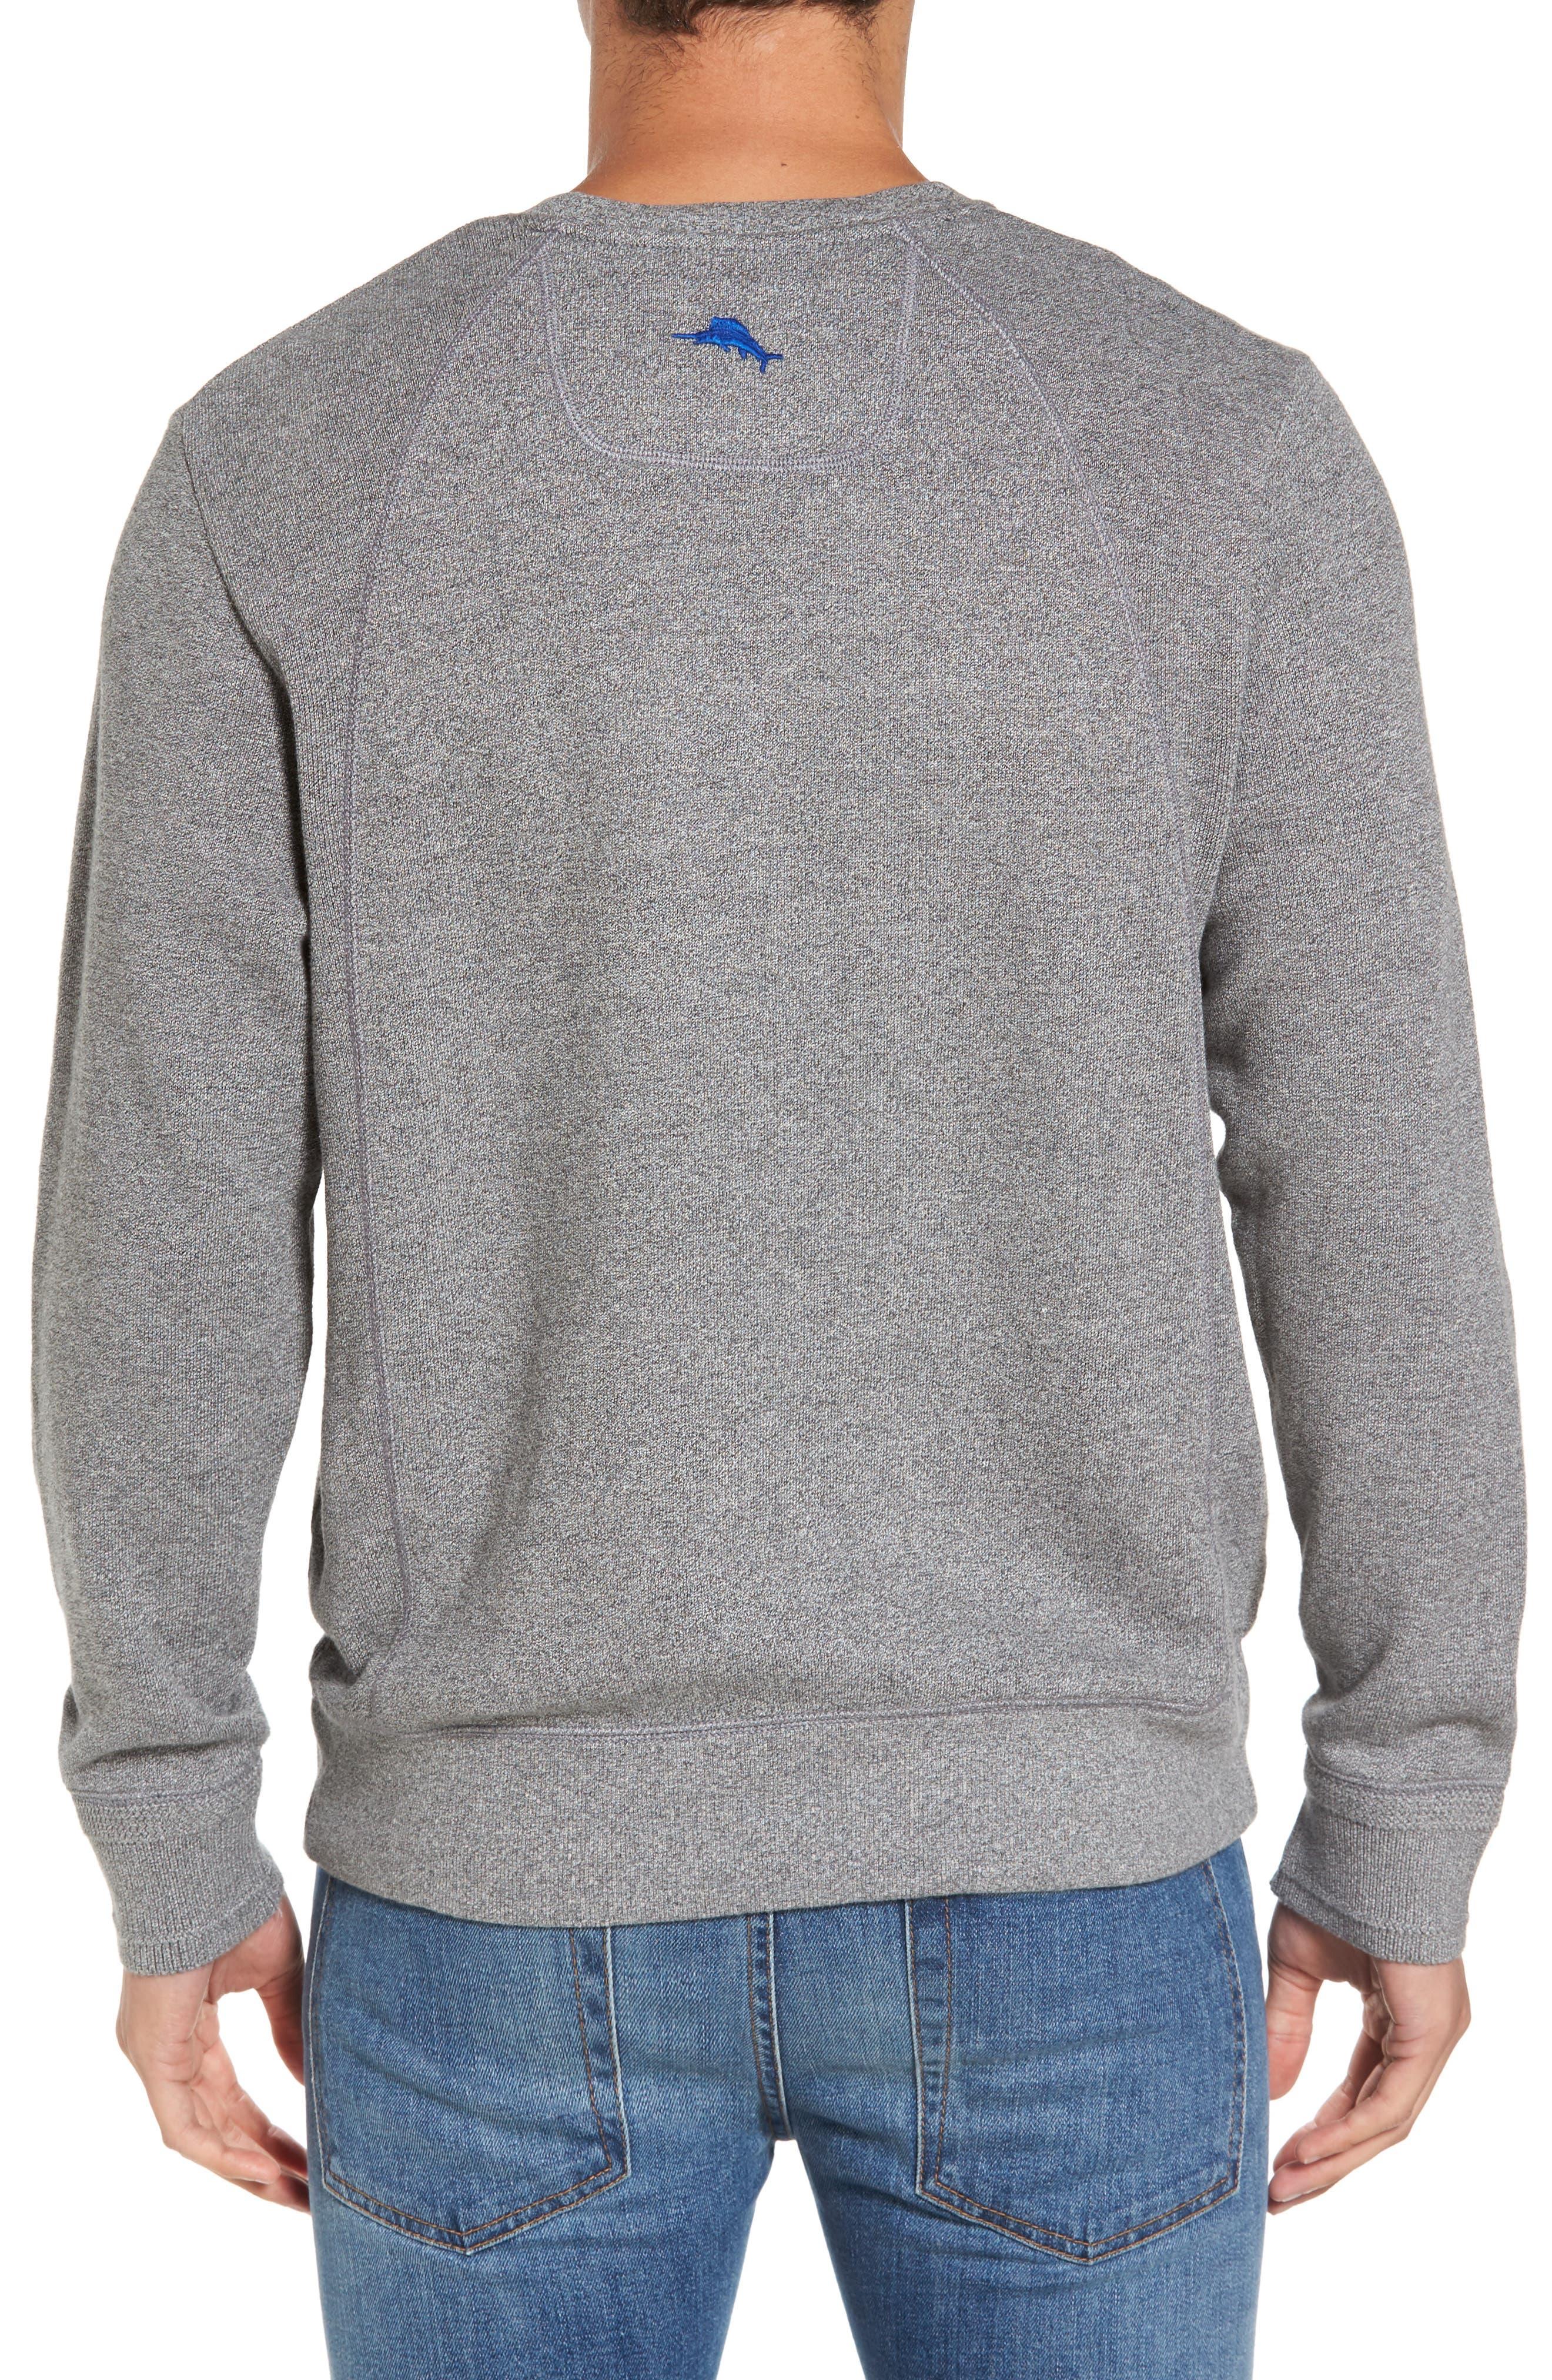 NFL Stitch of Liberty Embroidered Crewneck Sweatshirt,                             Alternate thumbnail 50, color,